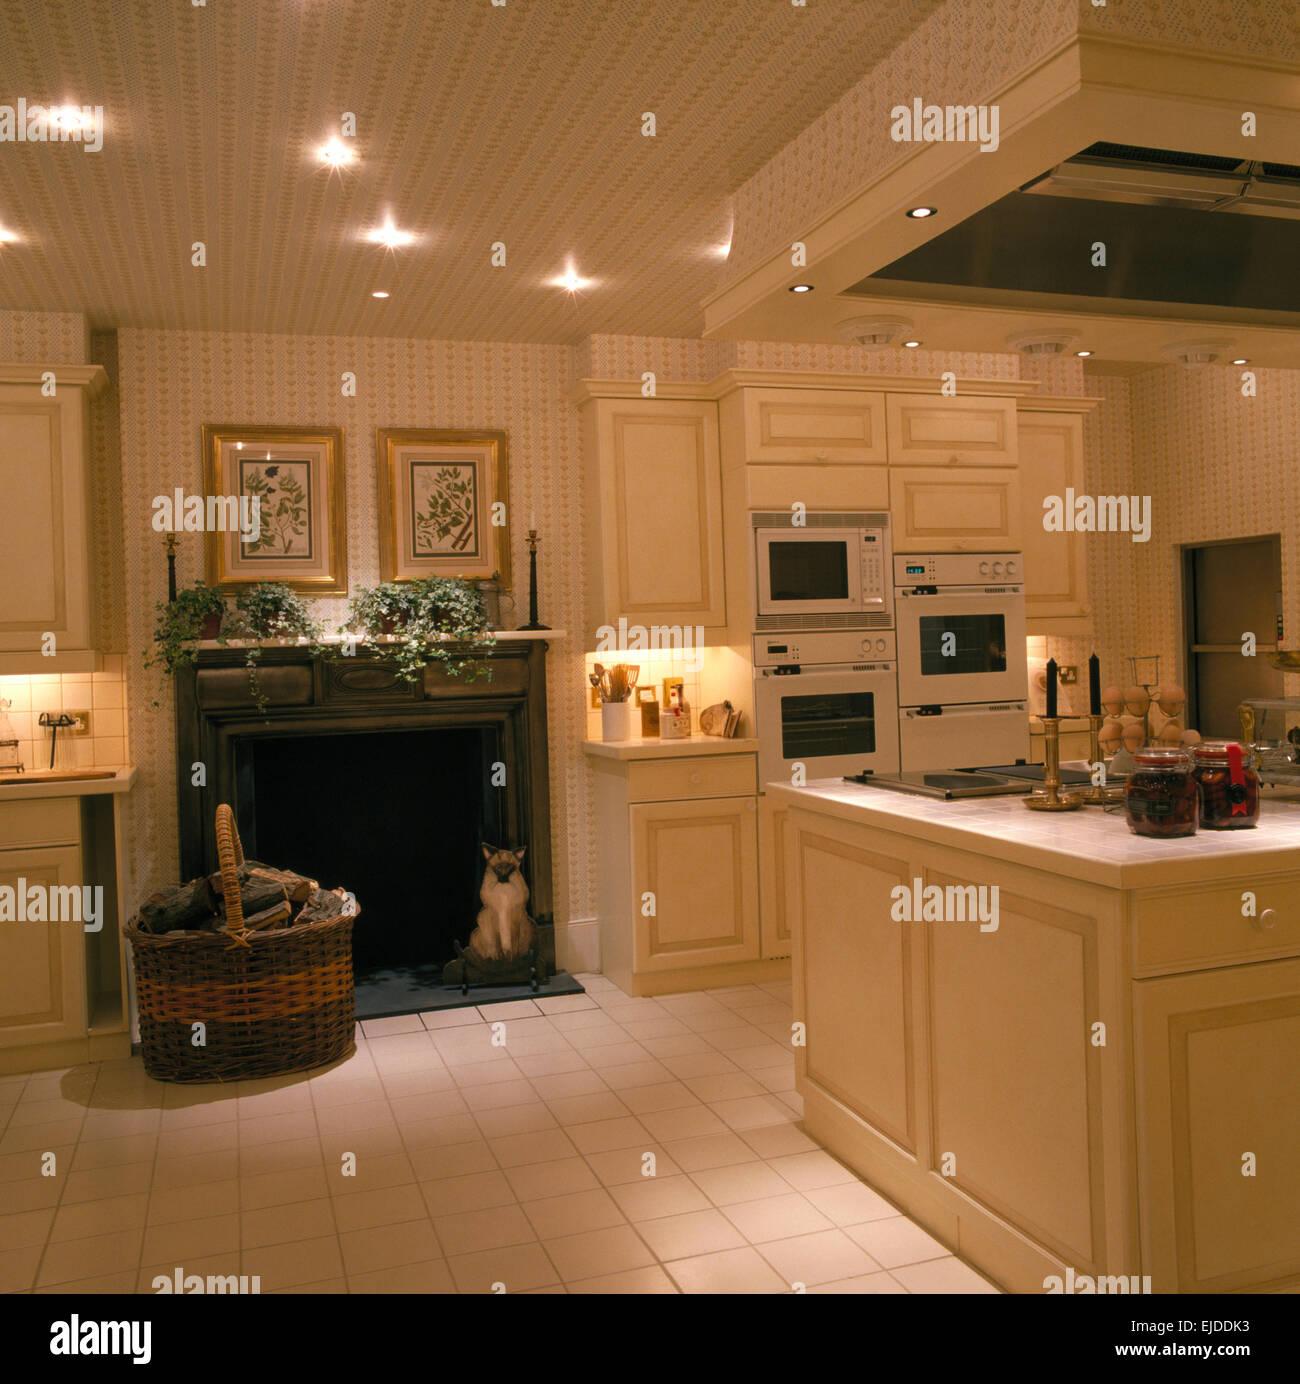 Kitchen Fireplace Stockfotos & Kitchen Fireplace Bilder - Alamy